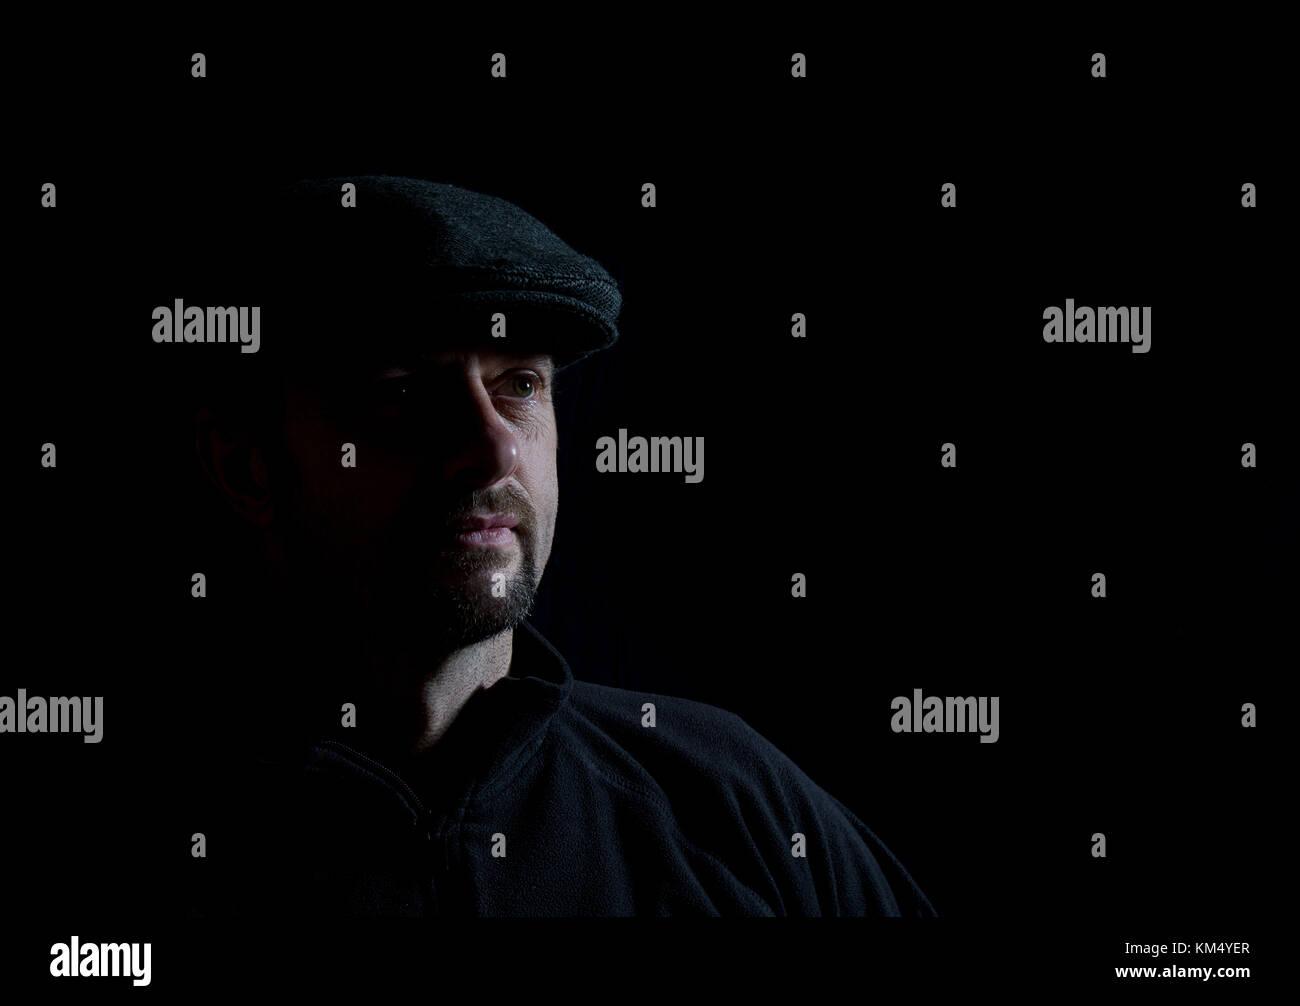 Low-key photo portrait of bearded man in dark cap, half-lit face, pensive pose. Low-key lighting, black background - Stock Image